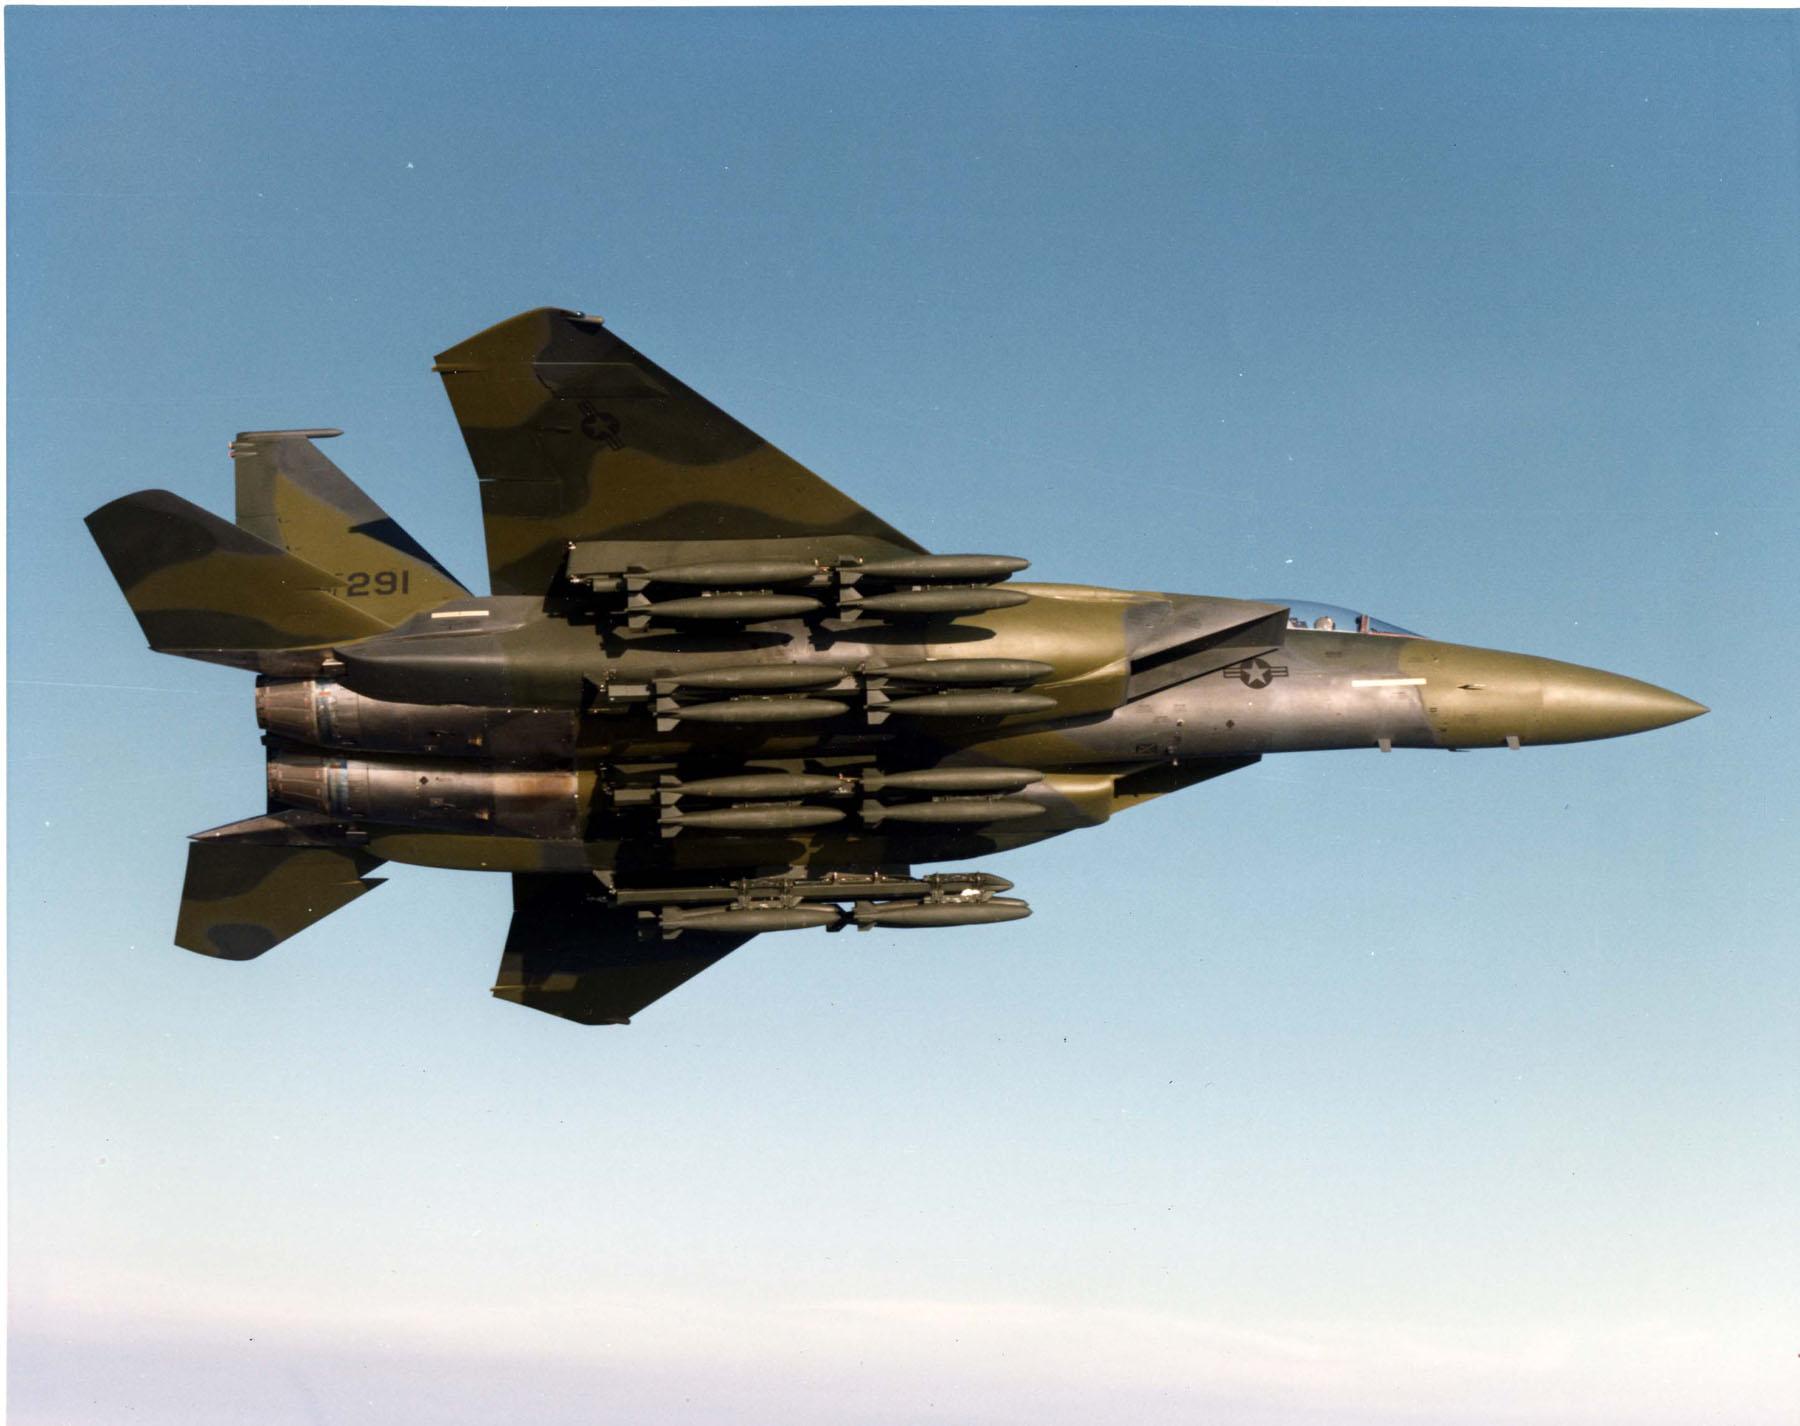 mcdonnell-douglas-f-15e-strike-eagle-prototype-modified-f-15b-4-mc-71-0291.jpg